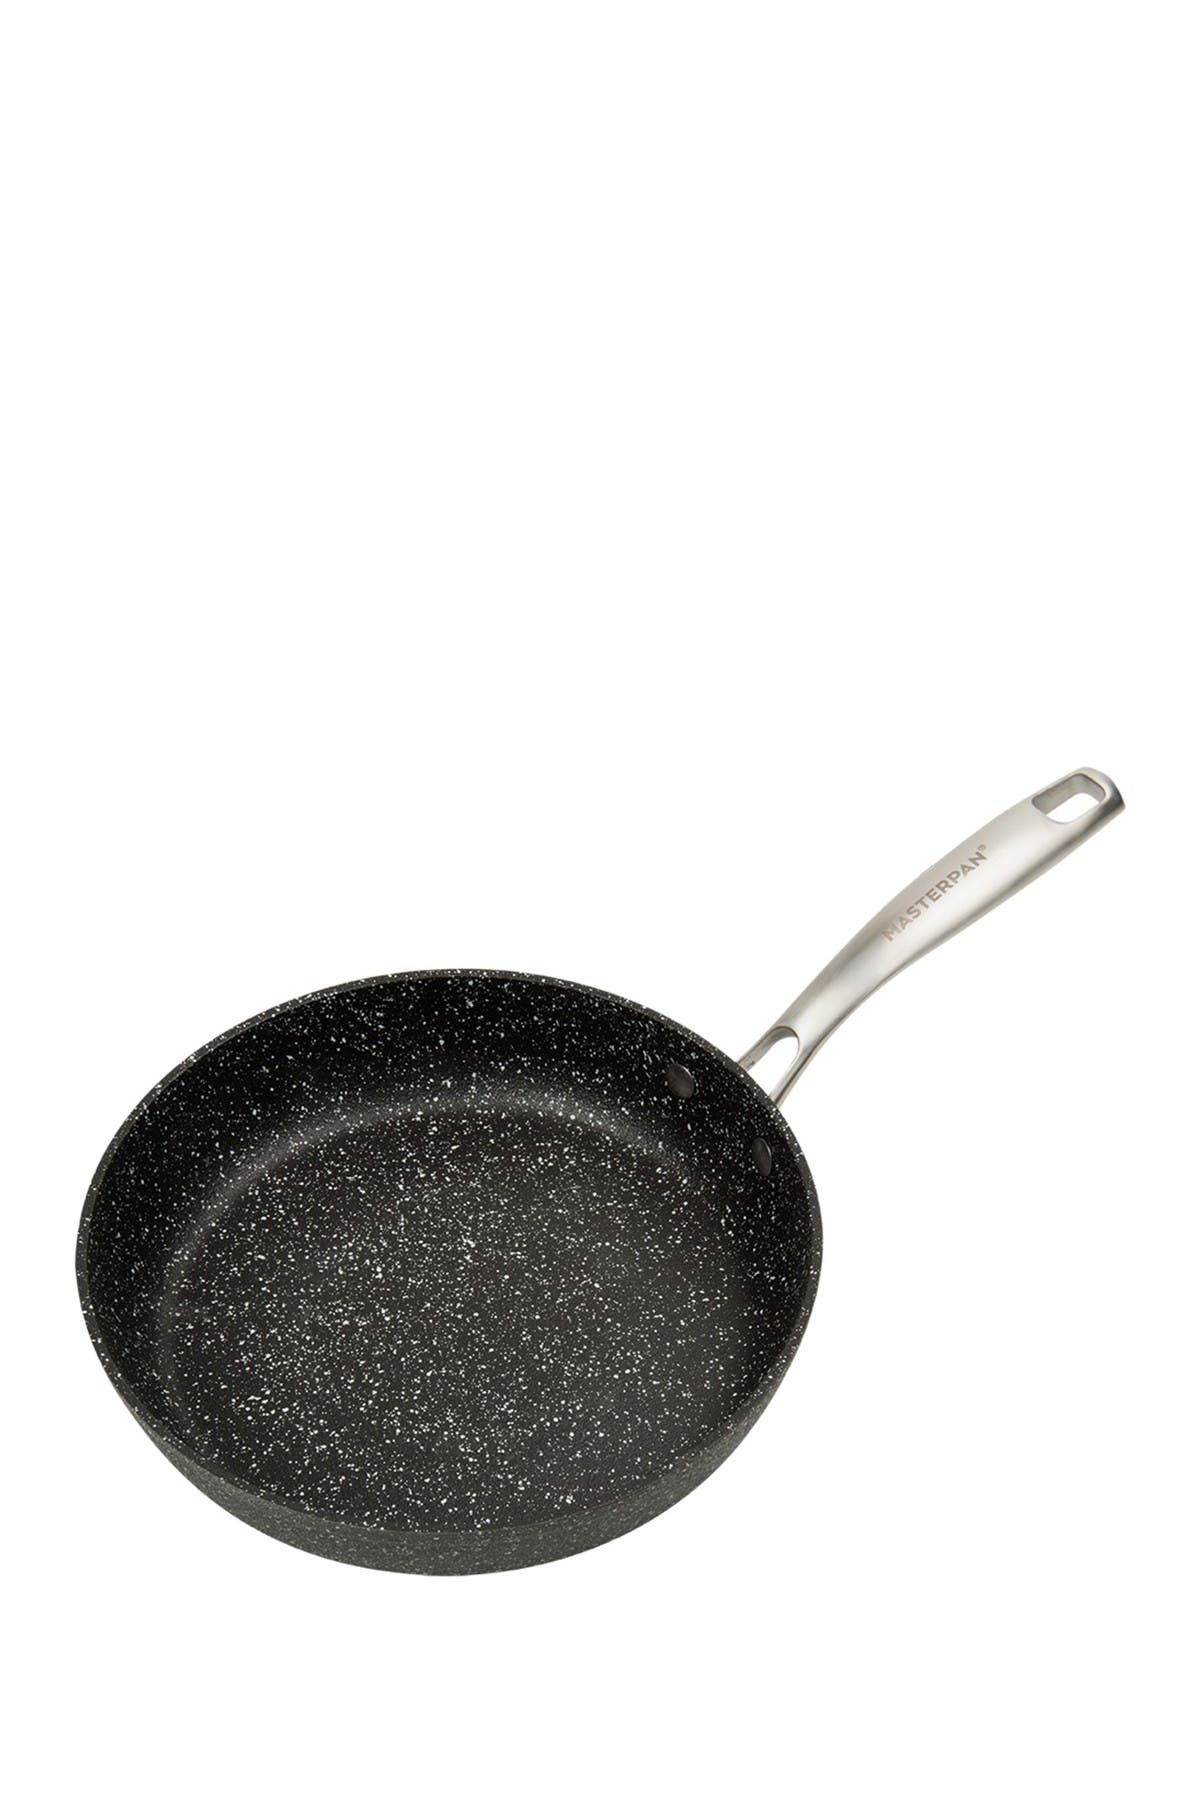 "Image of MASTERPAN Black Granite Ultra Non-Stick Cast Aluminum 9.5"" Fry Pan"